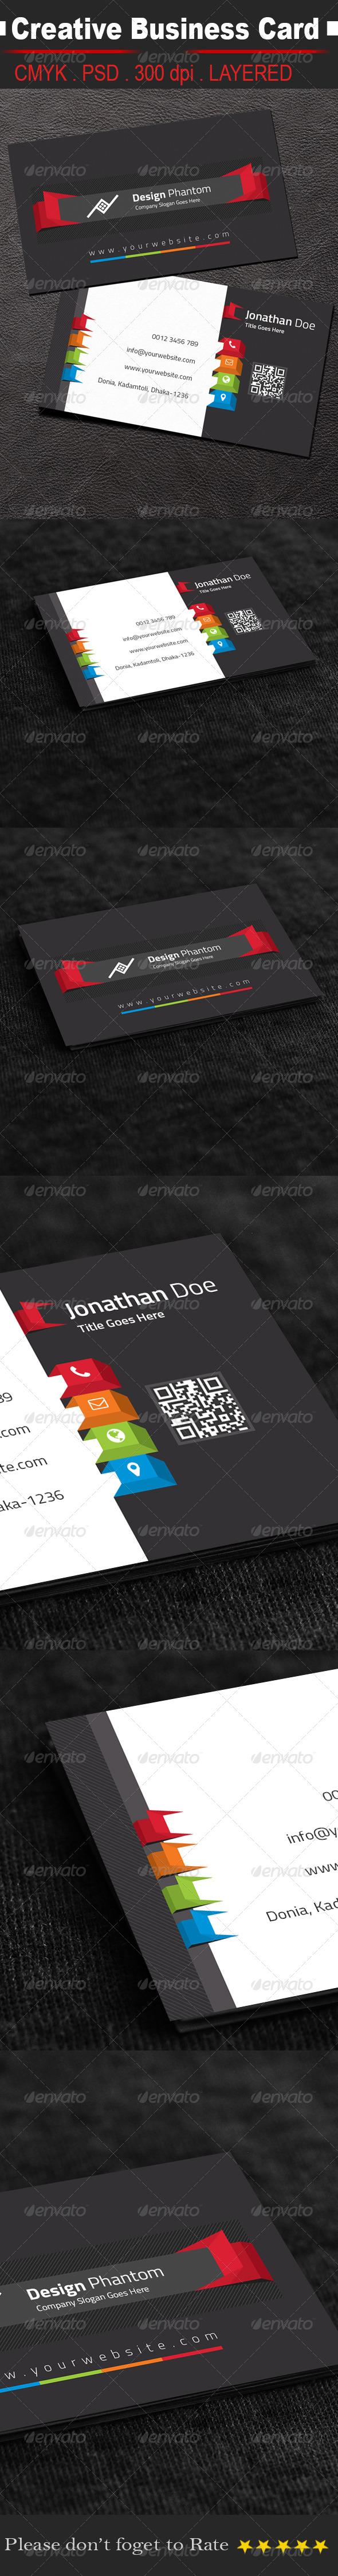 GraphicRiver Creative Business Card 8414008